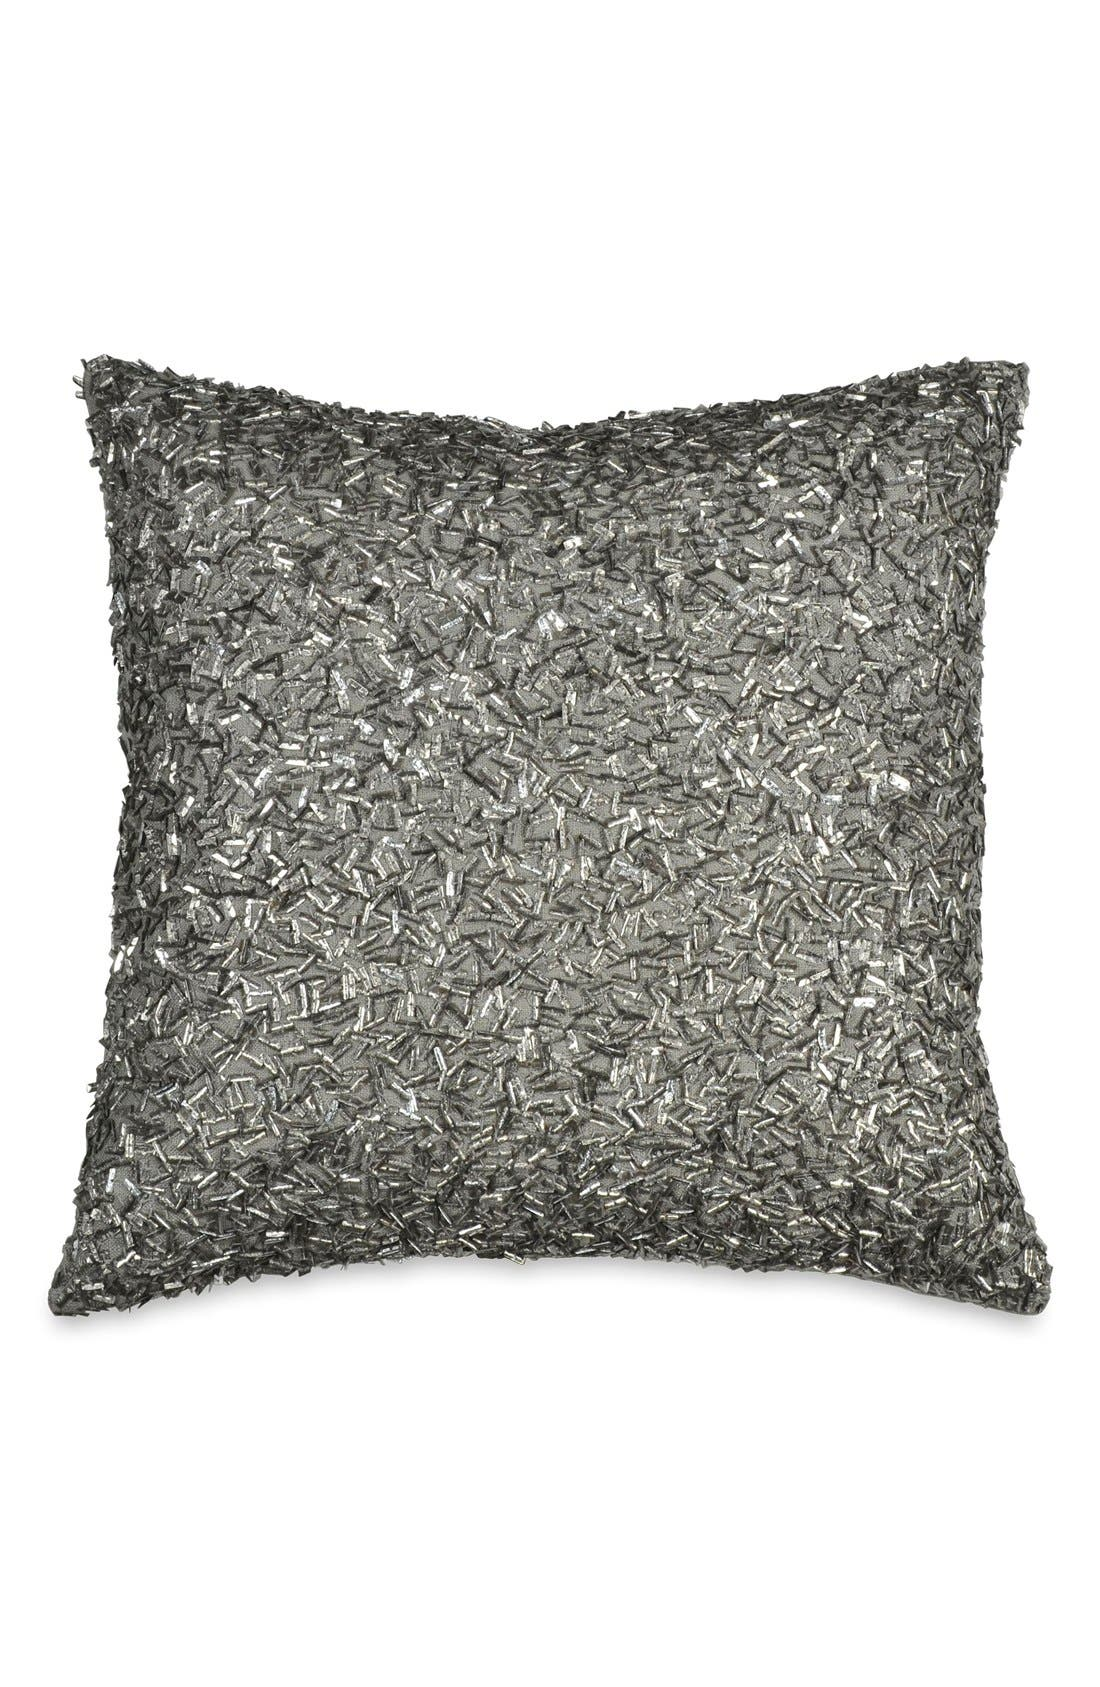 Donna Karan Collection 'Exhale' Pillow,                         Main,                         color, Gunmetal